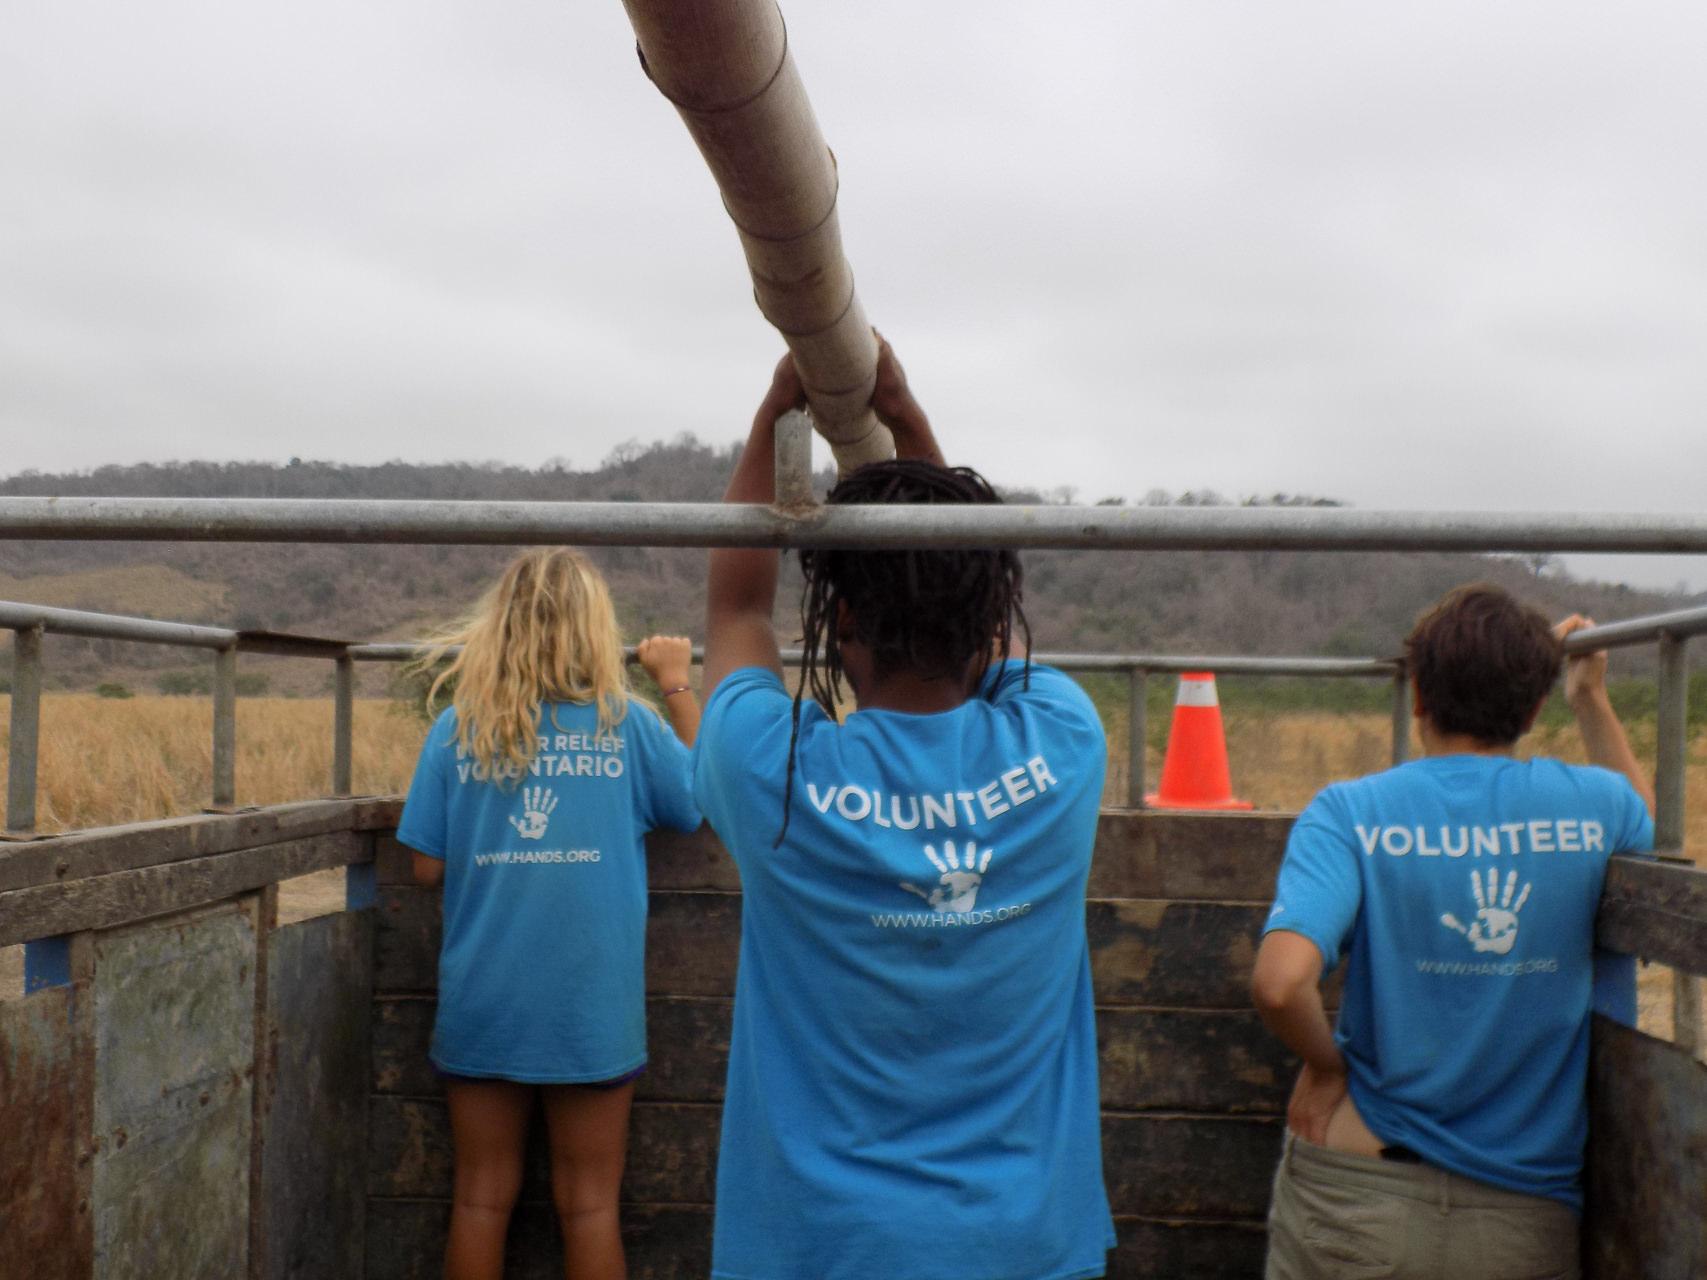 volunteers in a truck